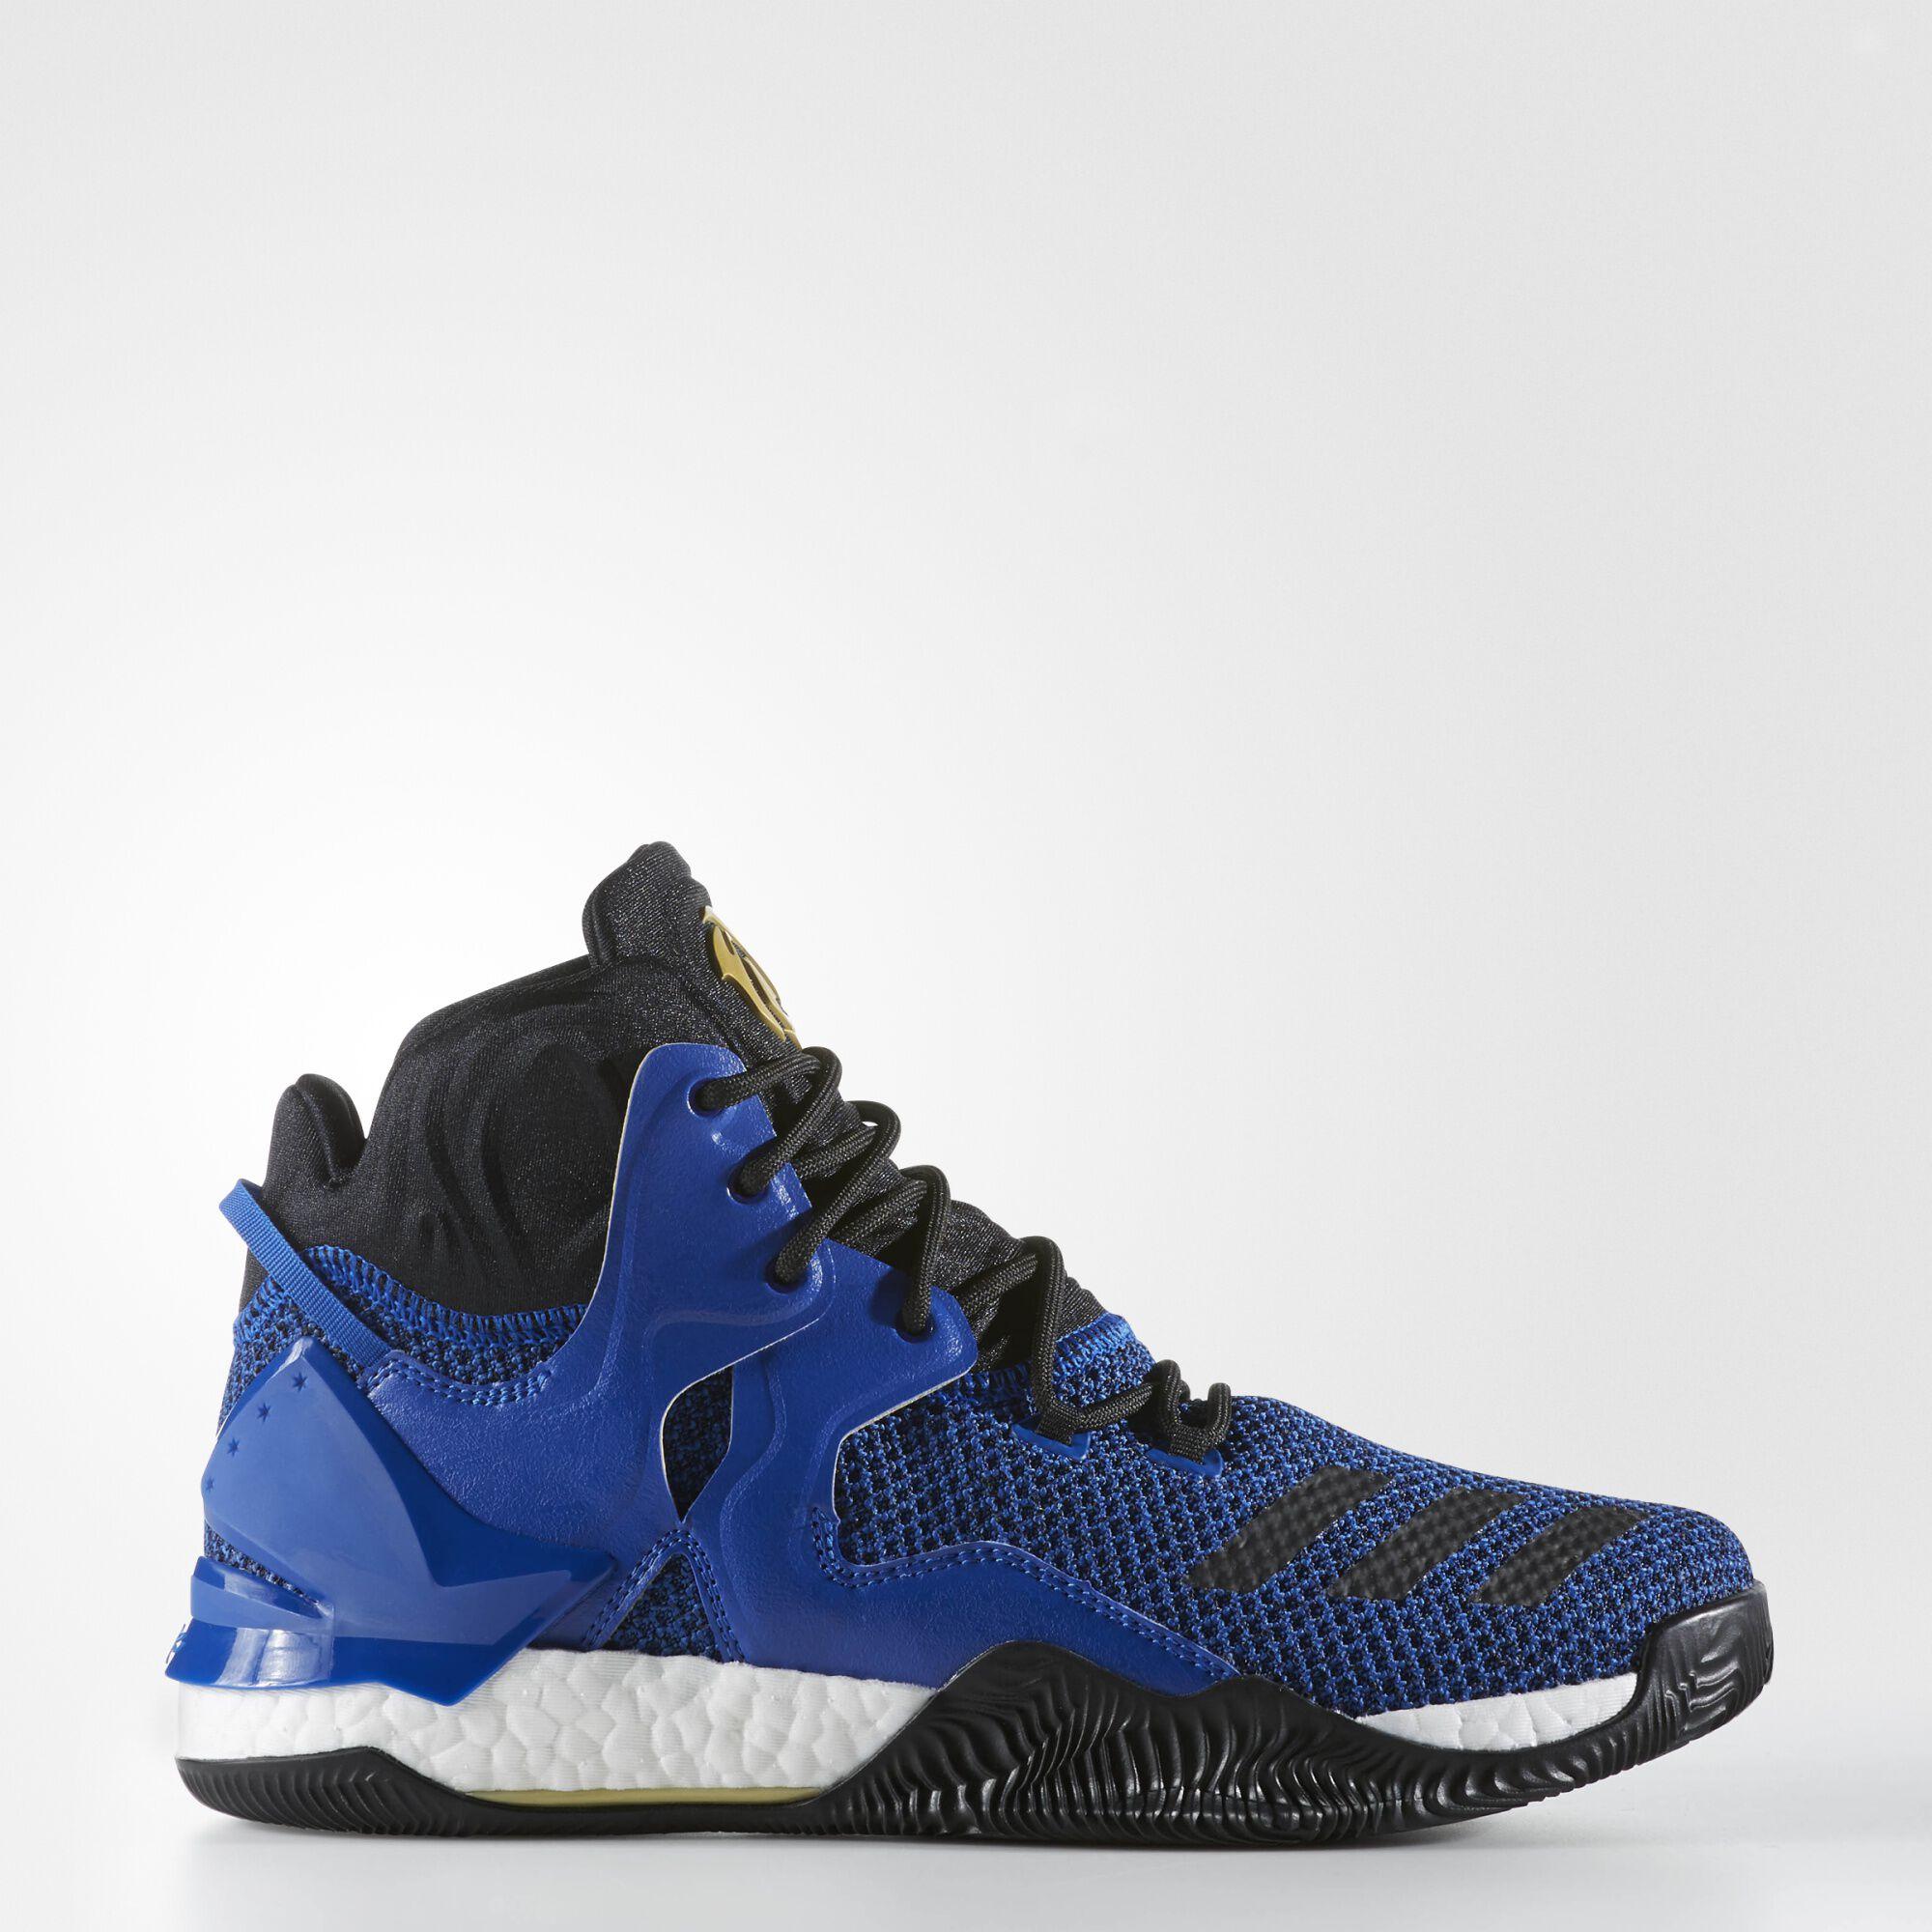 adidas carolina blue basketball shoes